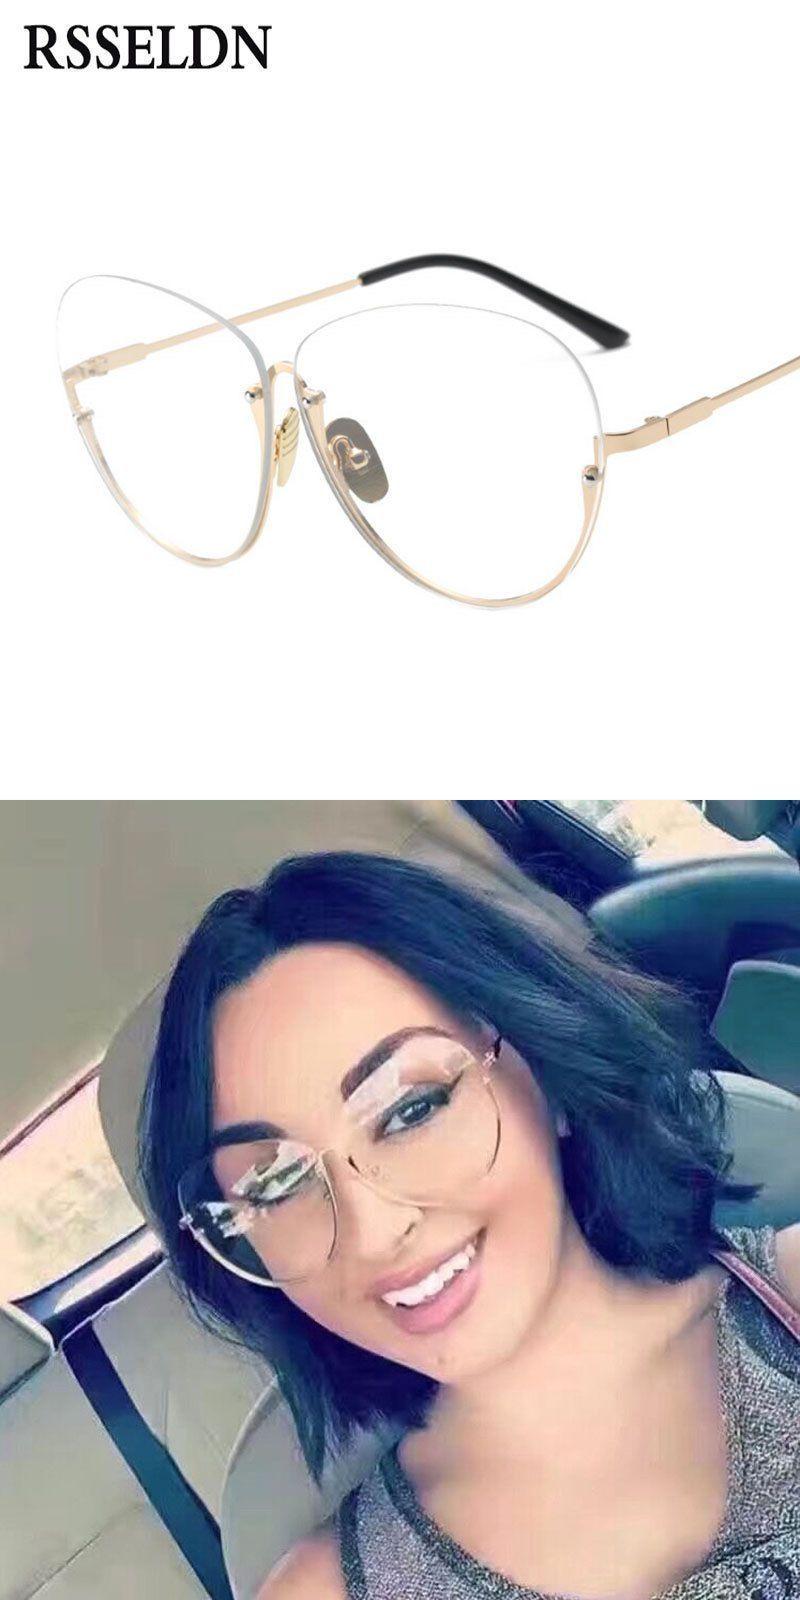 04f9b5d2298 Newest semi rimless glasses frame women eyeglasses frames branded clear lens  vintage eyeglass frame eyewear